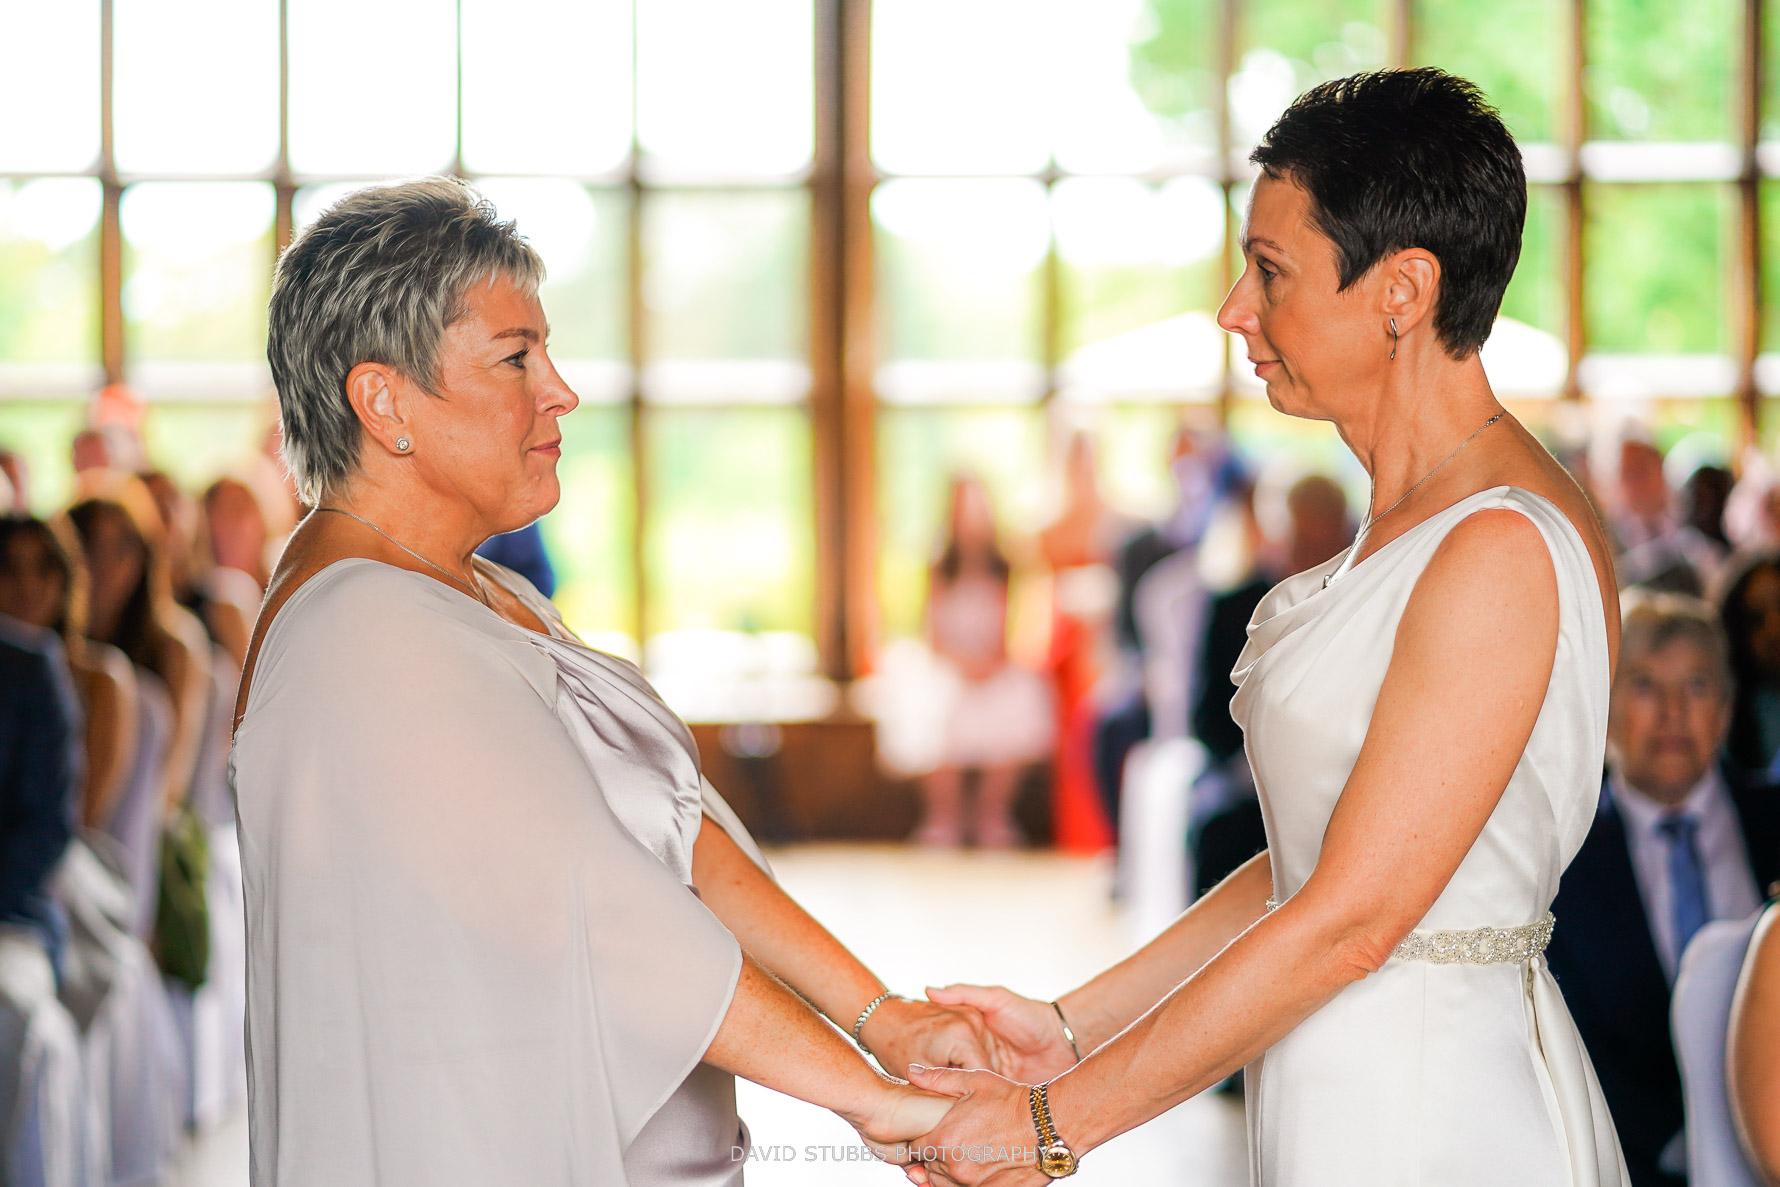 cicil wedding ceremony at hillbark hotel